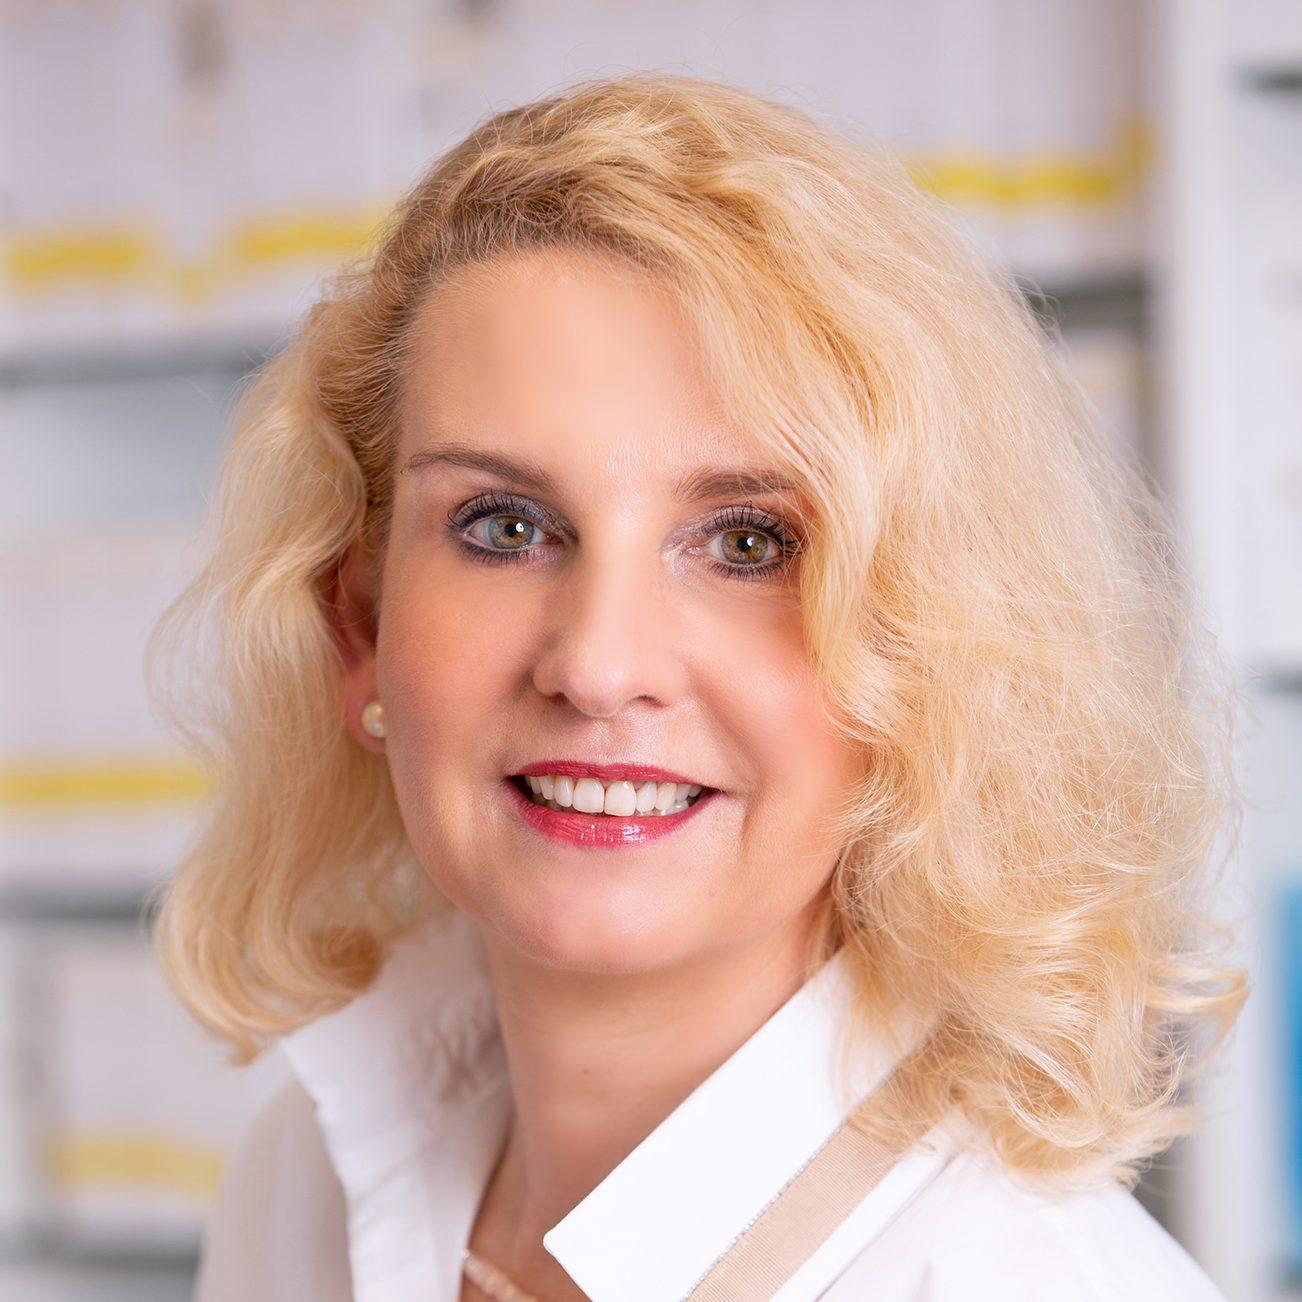 Marion Schomaker-Wessels